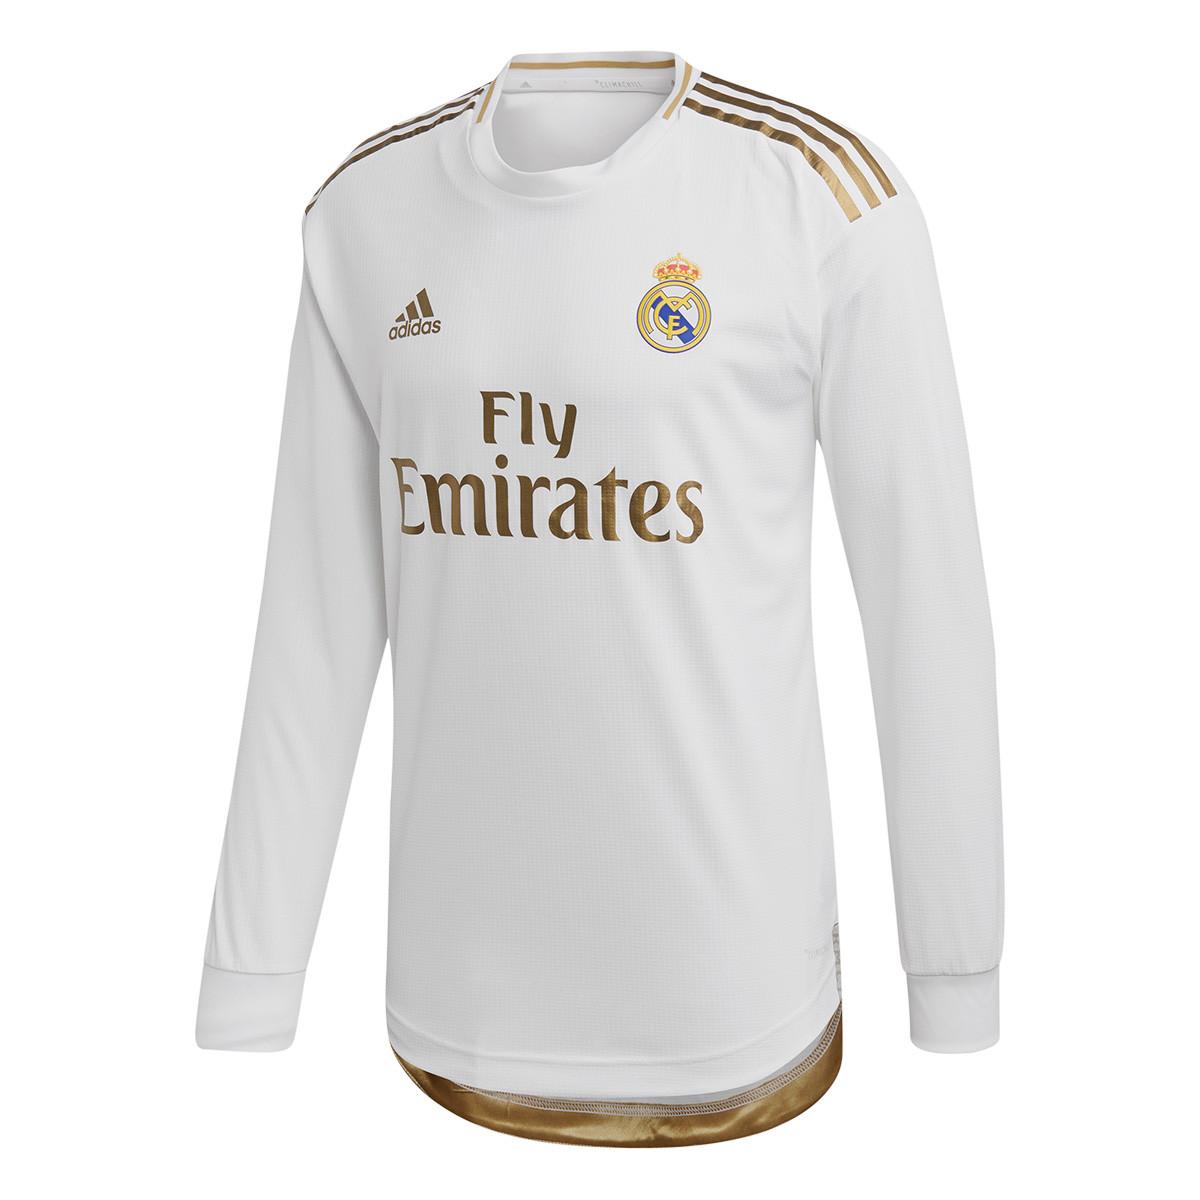 Camisola adidas Real Madrid Equipamento Principal Authentic 2019 2020 LS